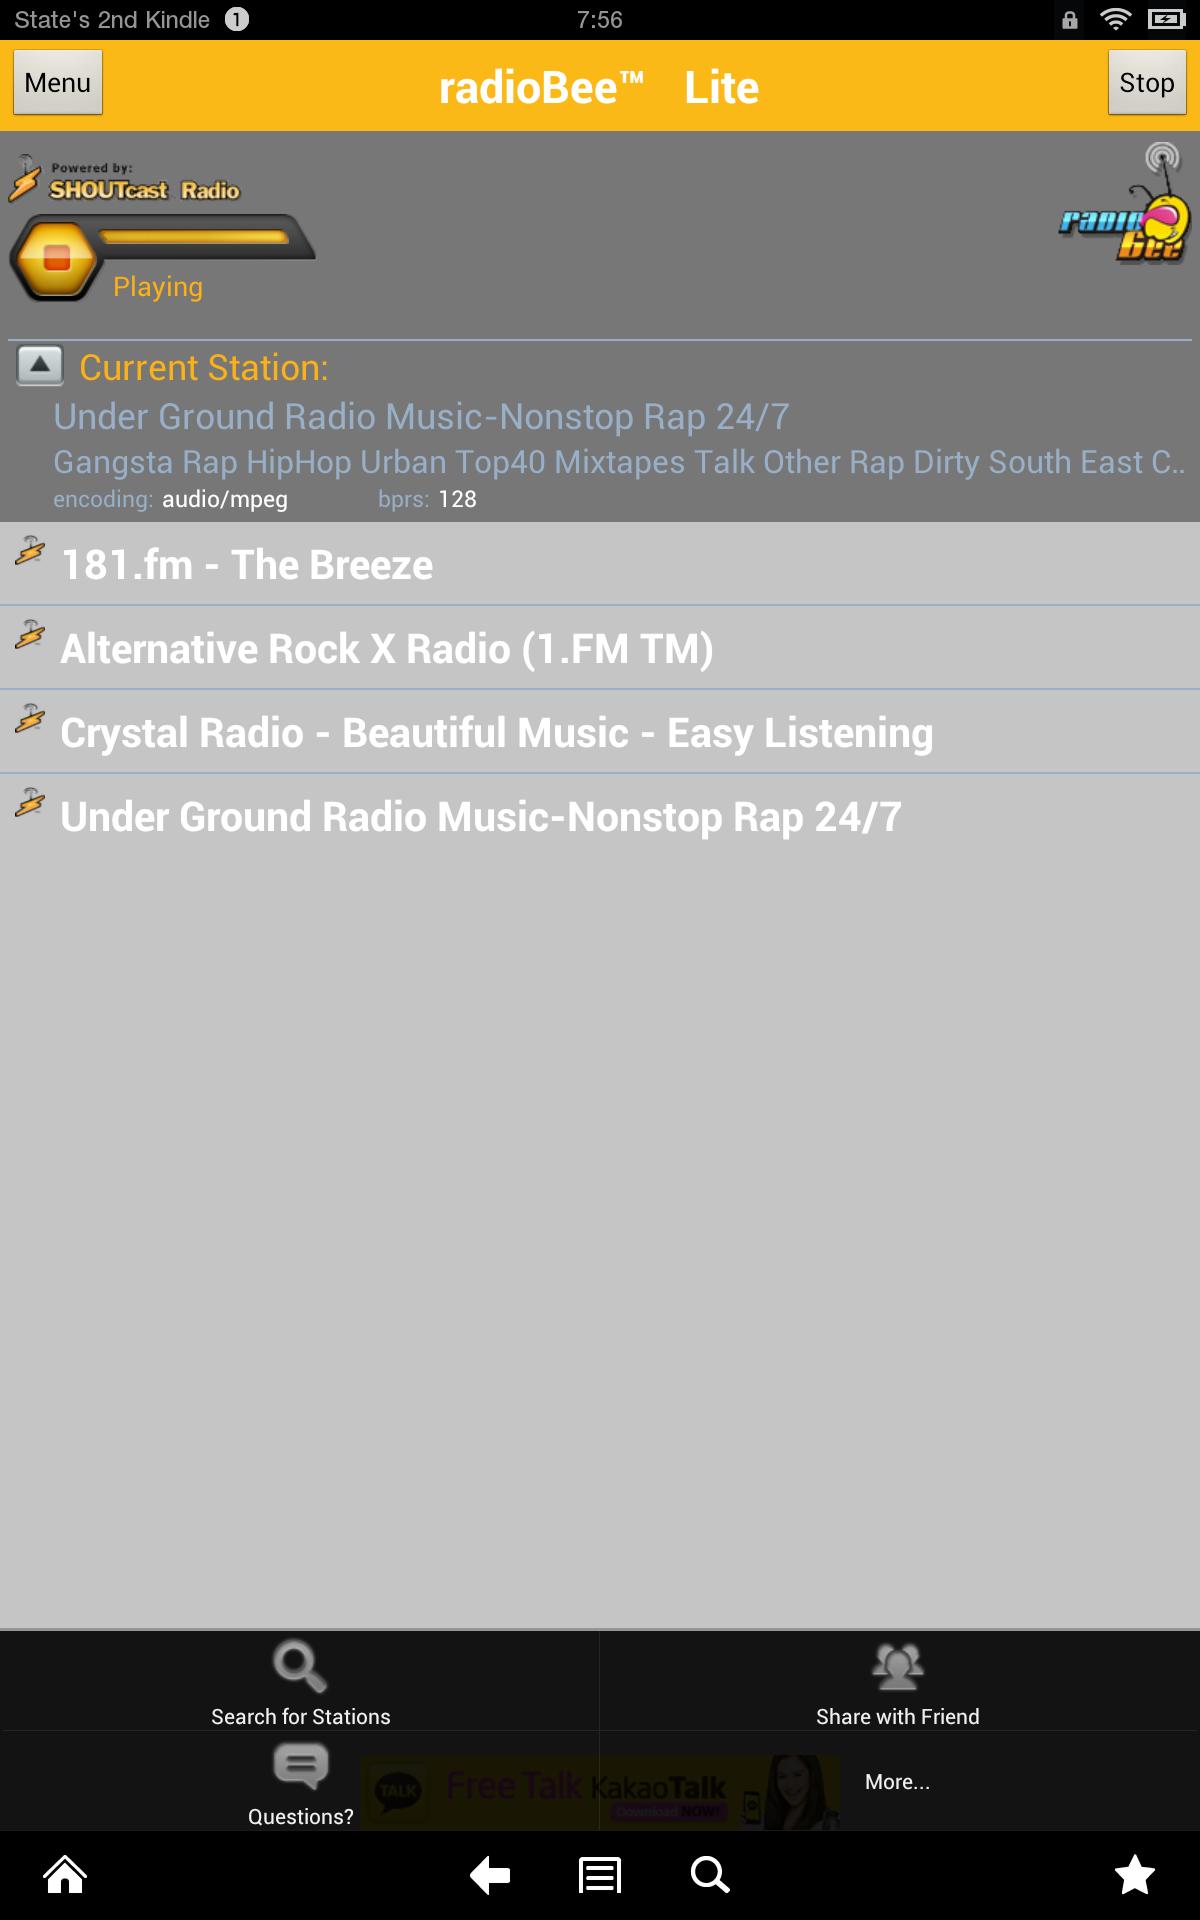 radioBee Lite: Amazon co uk: Appstore for Android